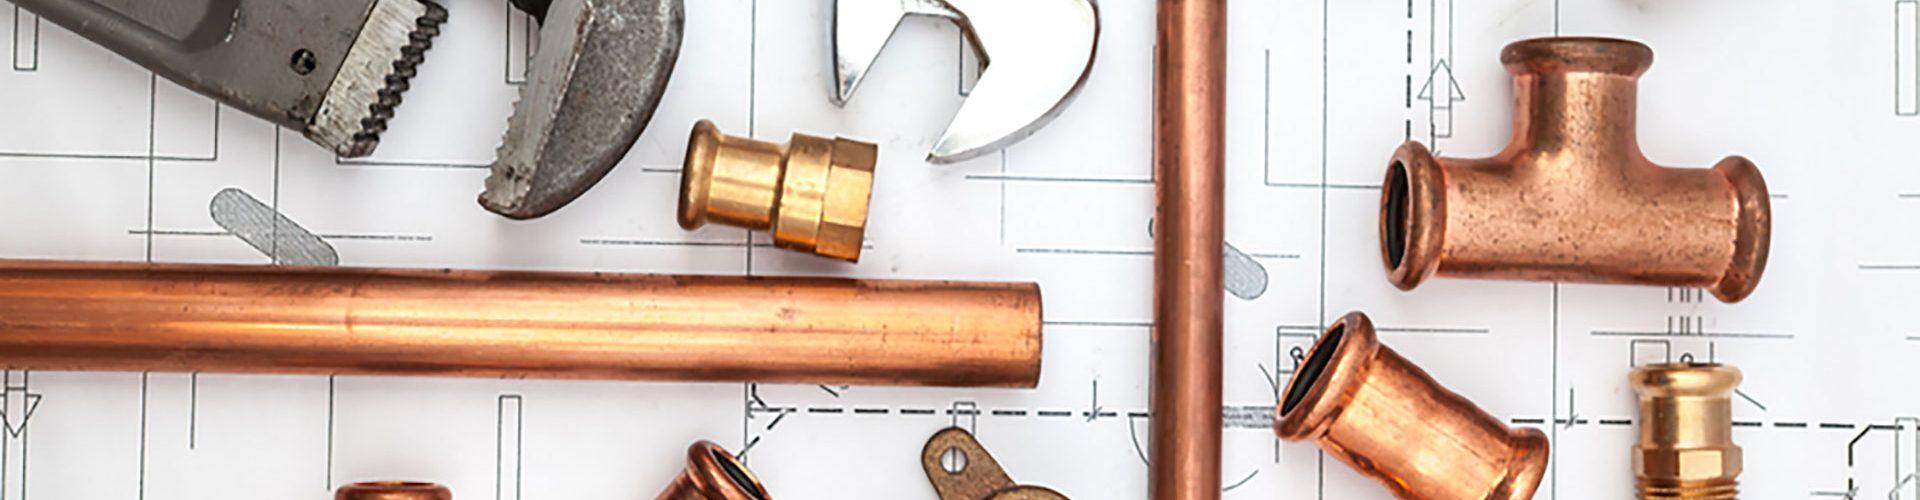 plumbing-tools-l